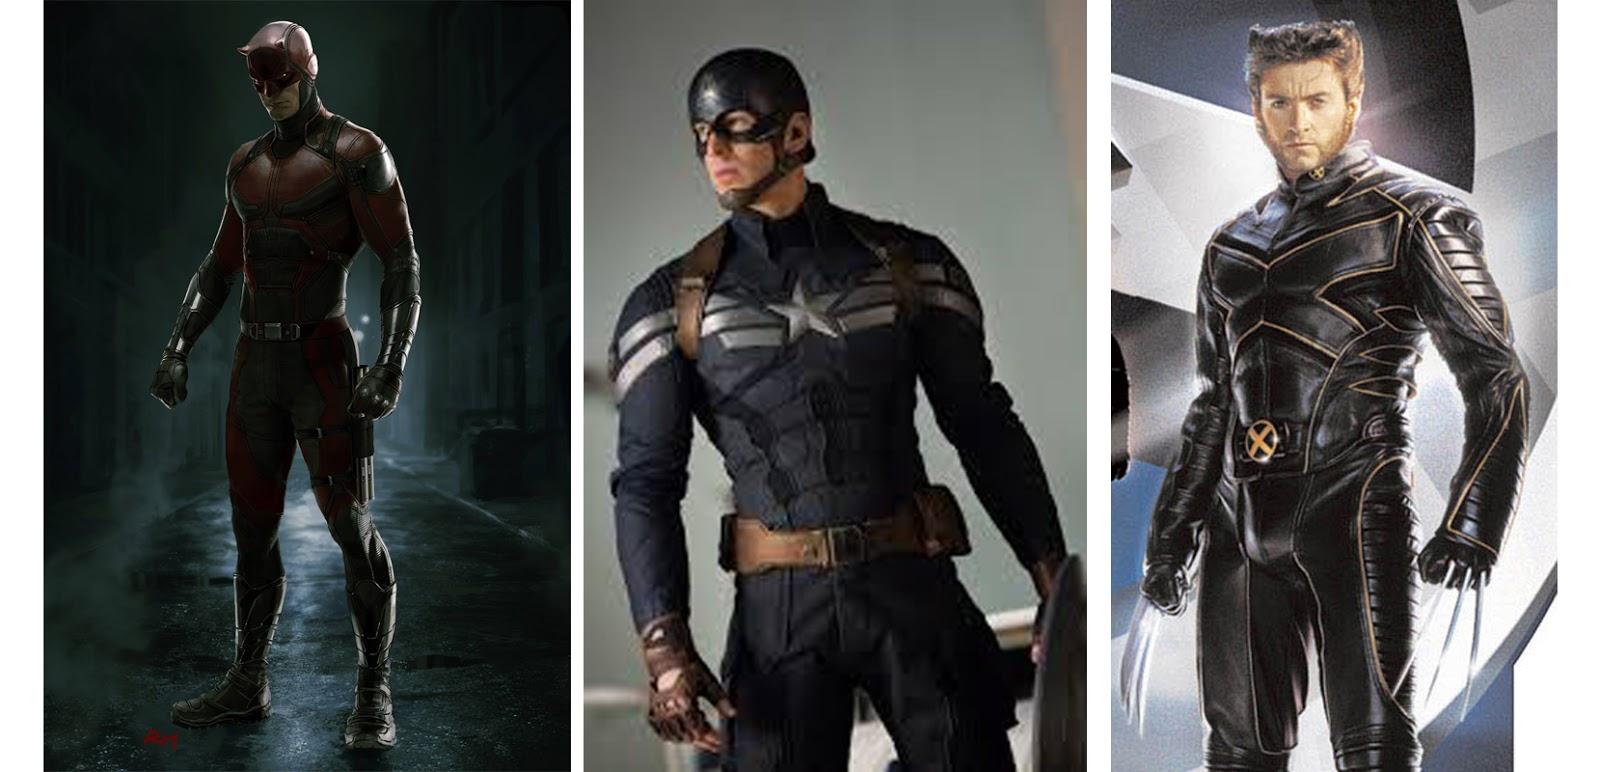 Devenir un super heros devenir un super heros - Costume de super heros ...